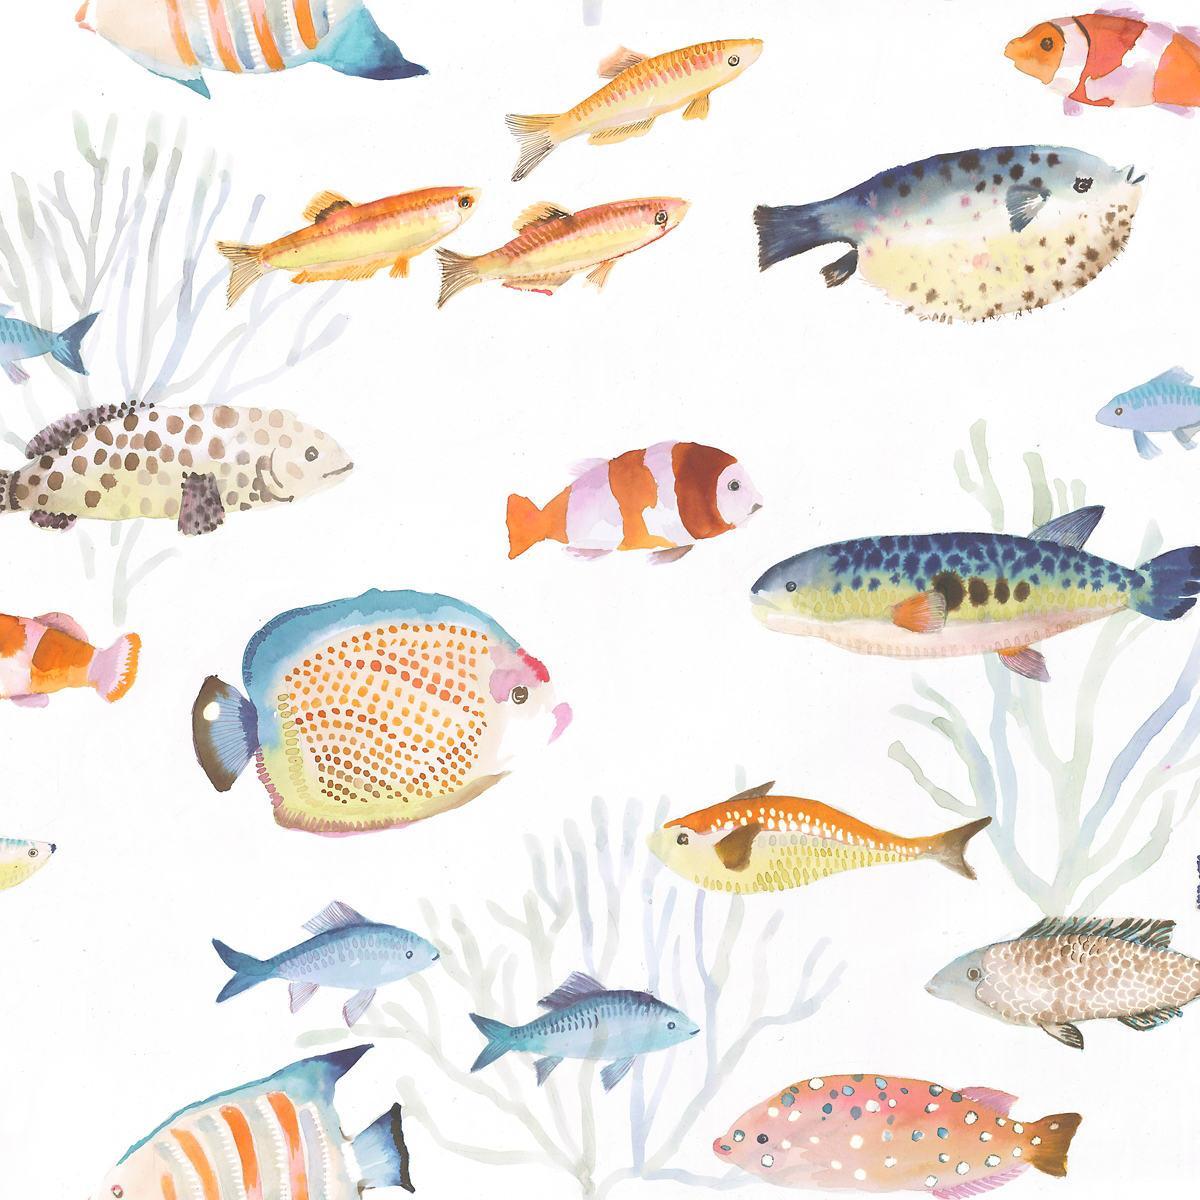 Fish Duvet Cover Set with Pillow Shams Array of Fish Marine Life Print